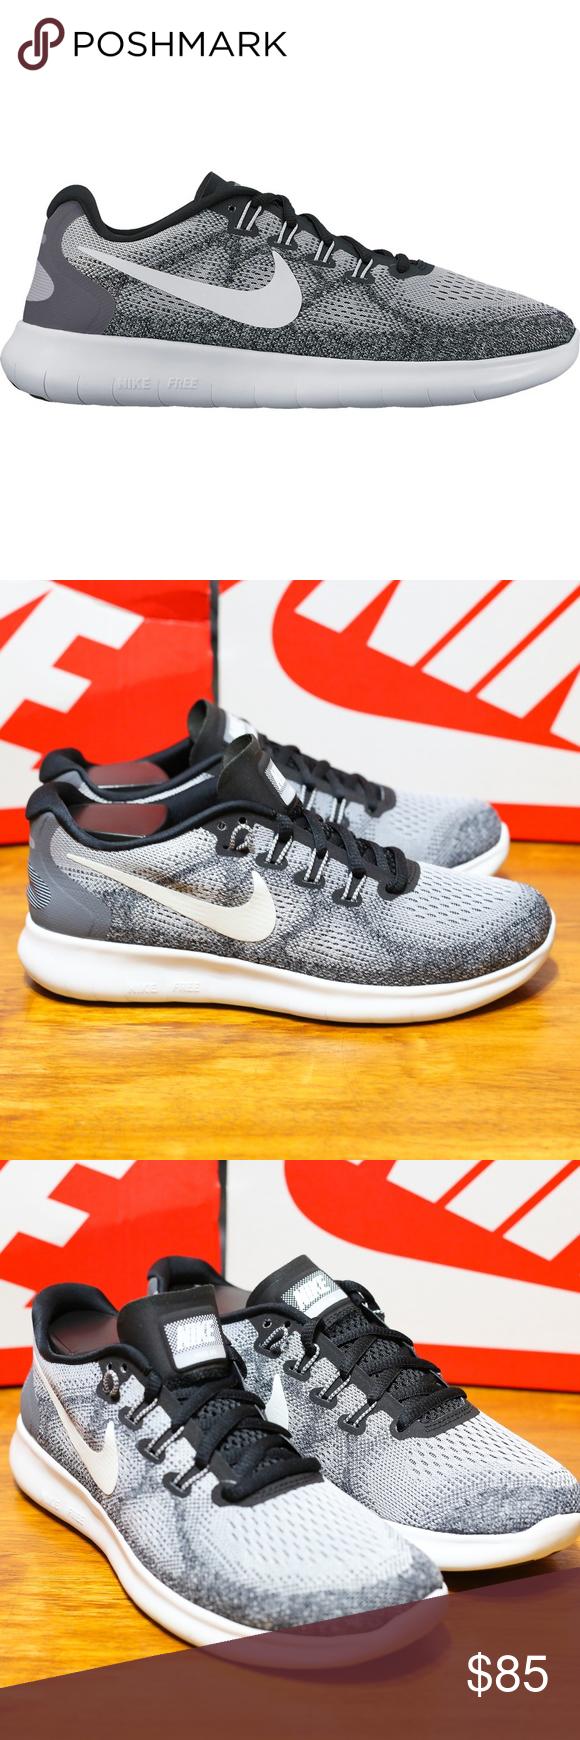 026fe45434cf Nike Womens Free RN Run 2017 Running Shoes Grey FK Nike Womens Free RN 2017  Running